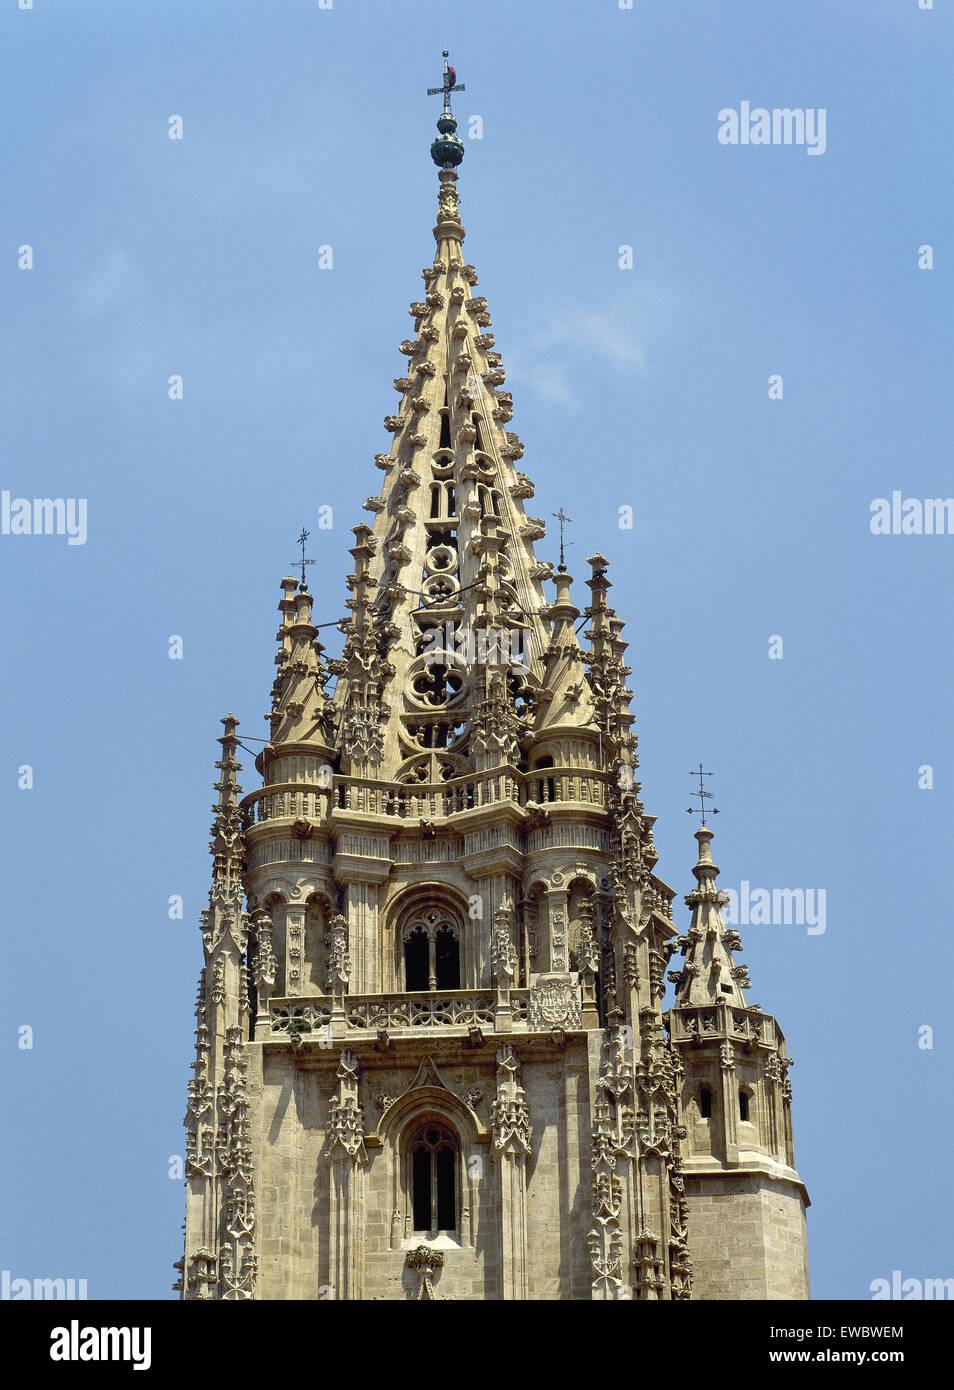 Spagna. Asturias. Oviedo. Cattedrale di San Salvador. La torre gotica. Dettaglio. Immagini Stock